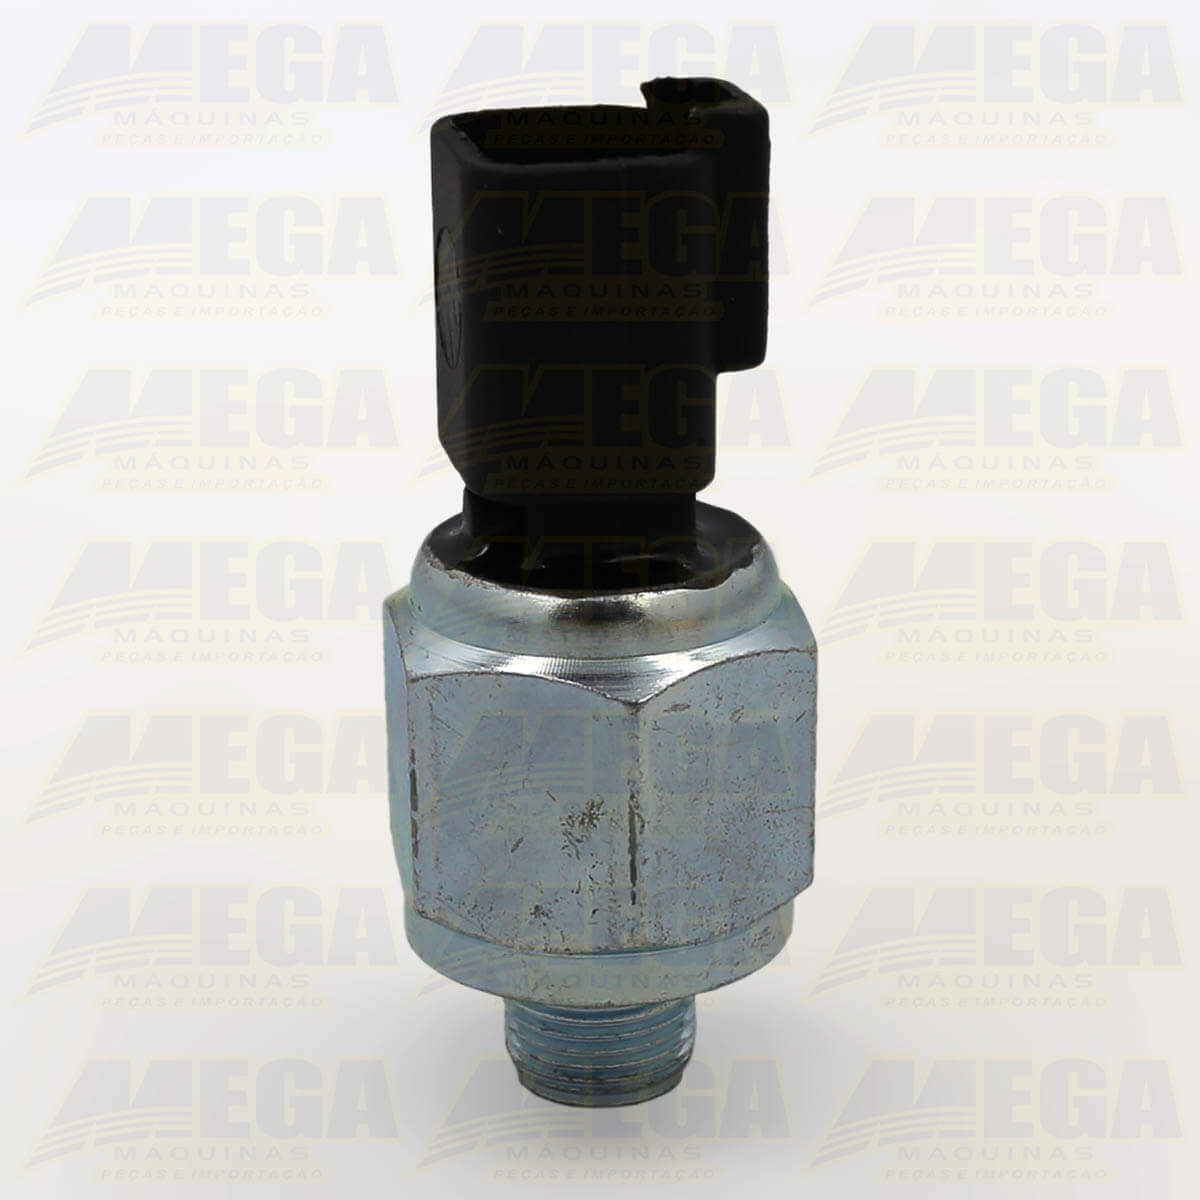 Sensor - 701/80626